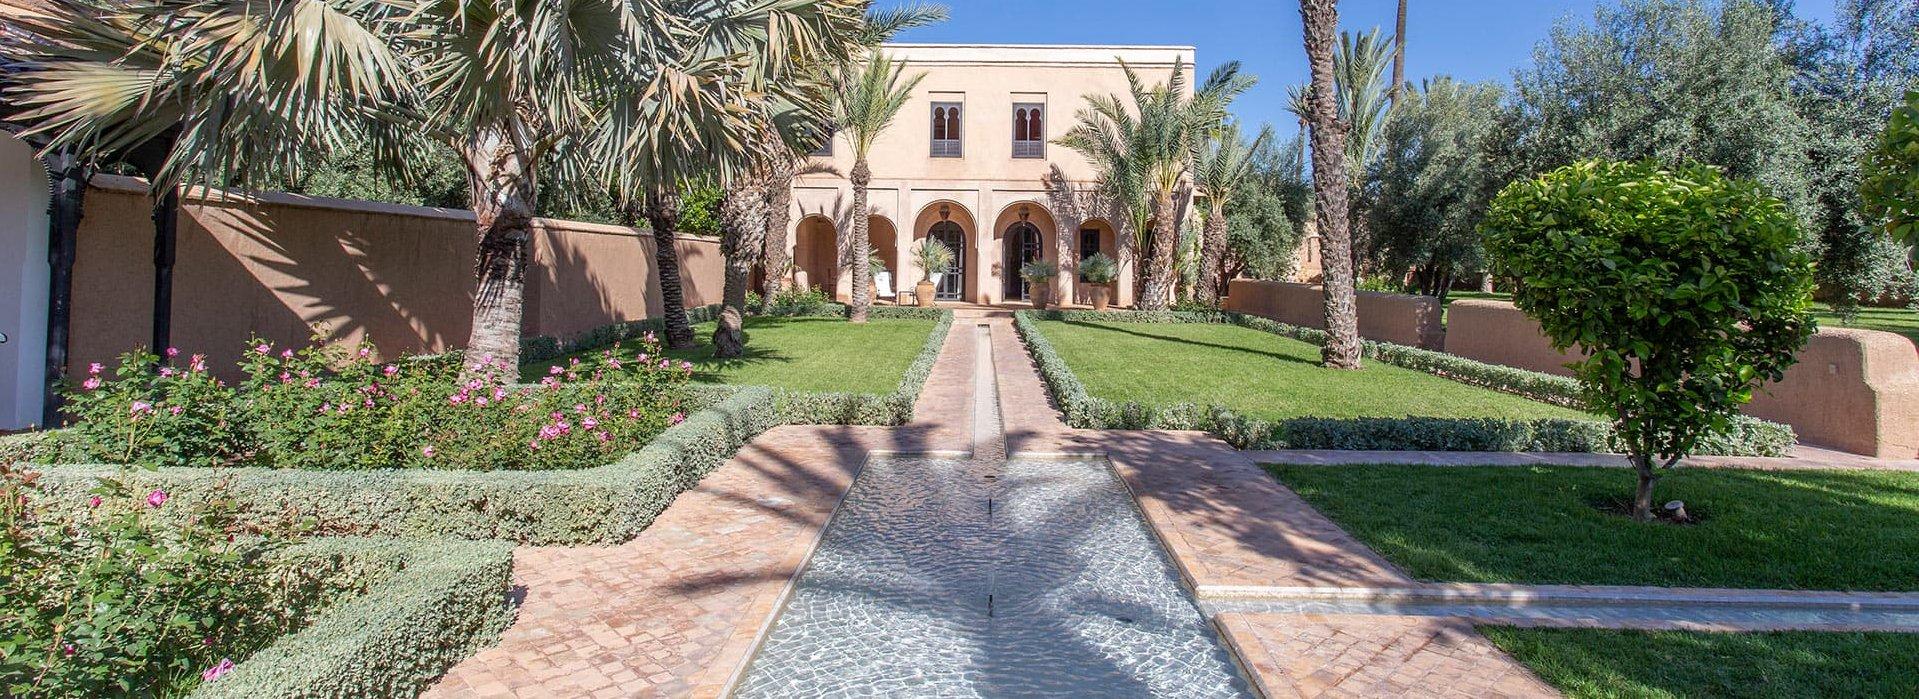 large-luxurious-family-villa-marrakech